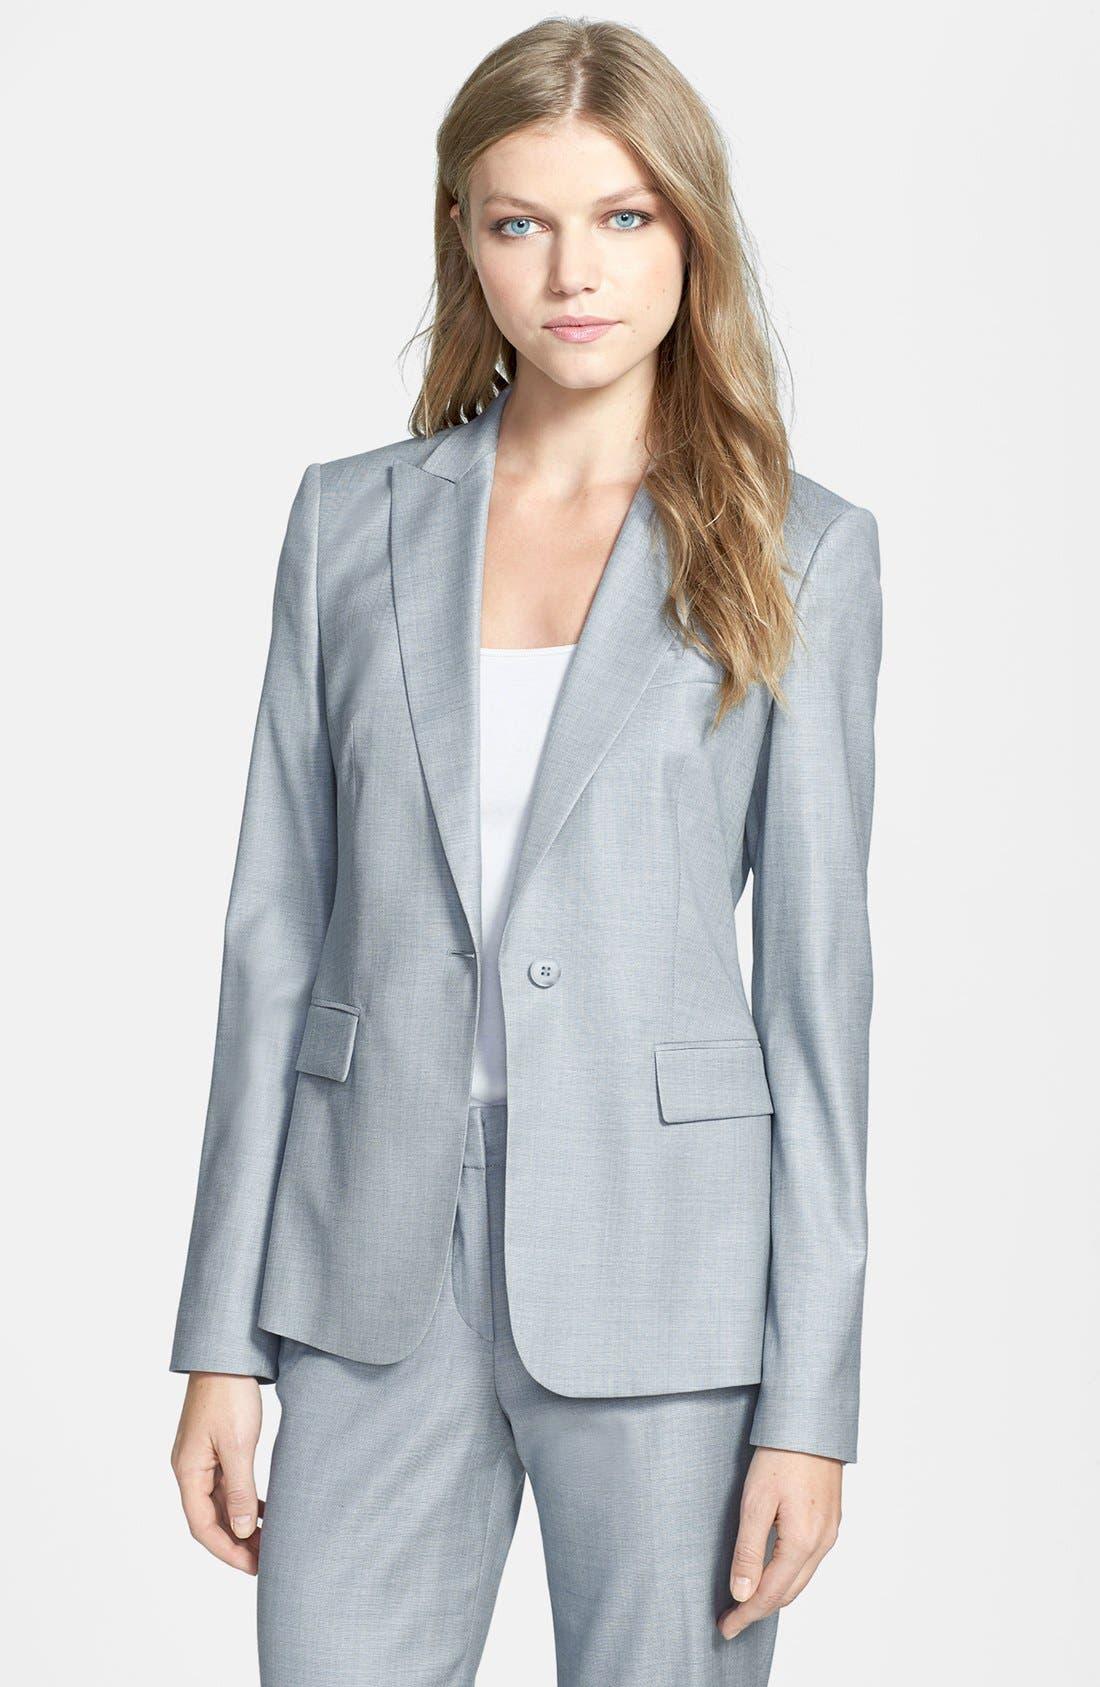 Main Image - BOSS HUGO BOSS 'Juicy 6' Stretch Wool Jacket